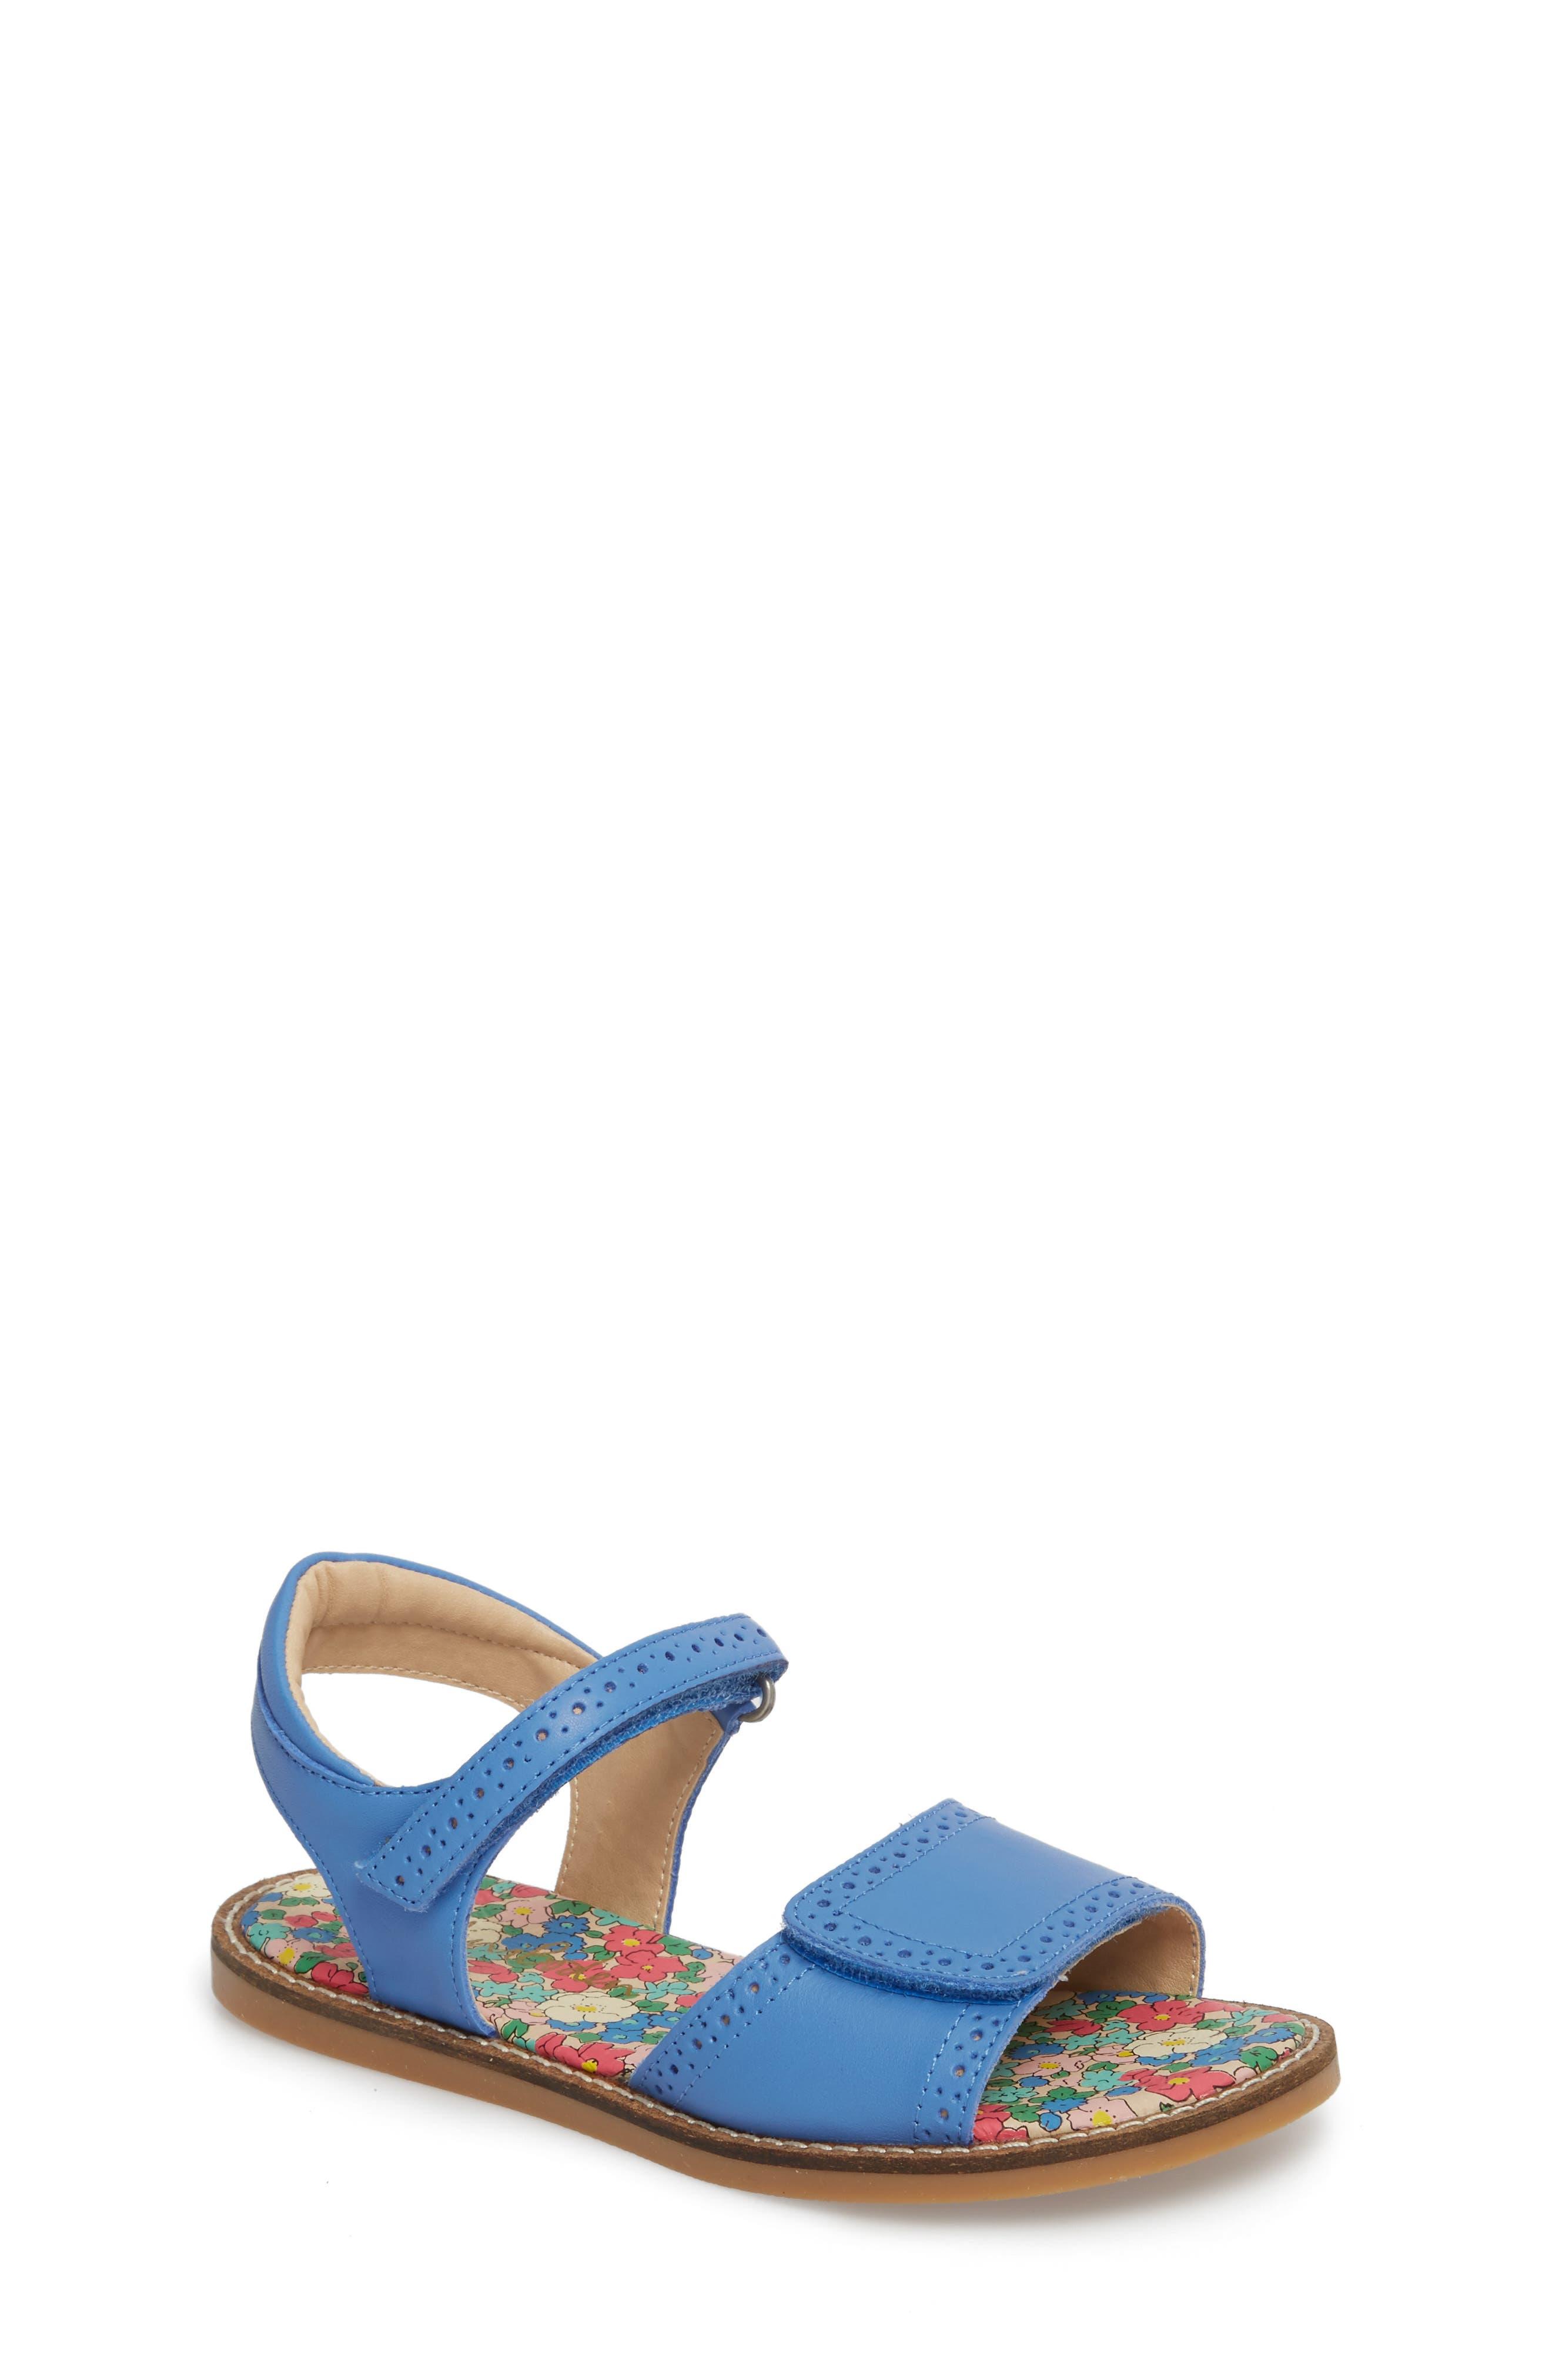 Adjustable Quarter Strap Sandal,                             Main thumbnail 1, color,                             424